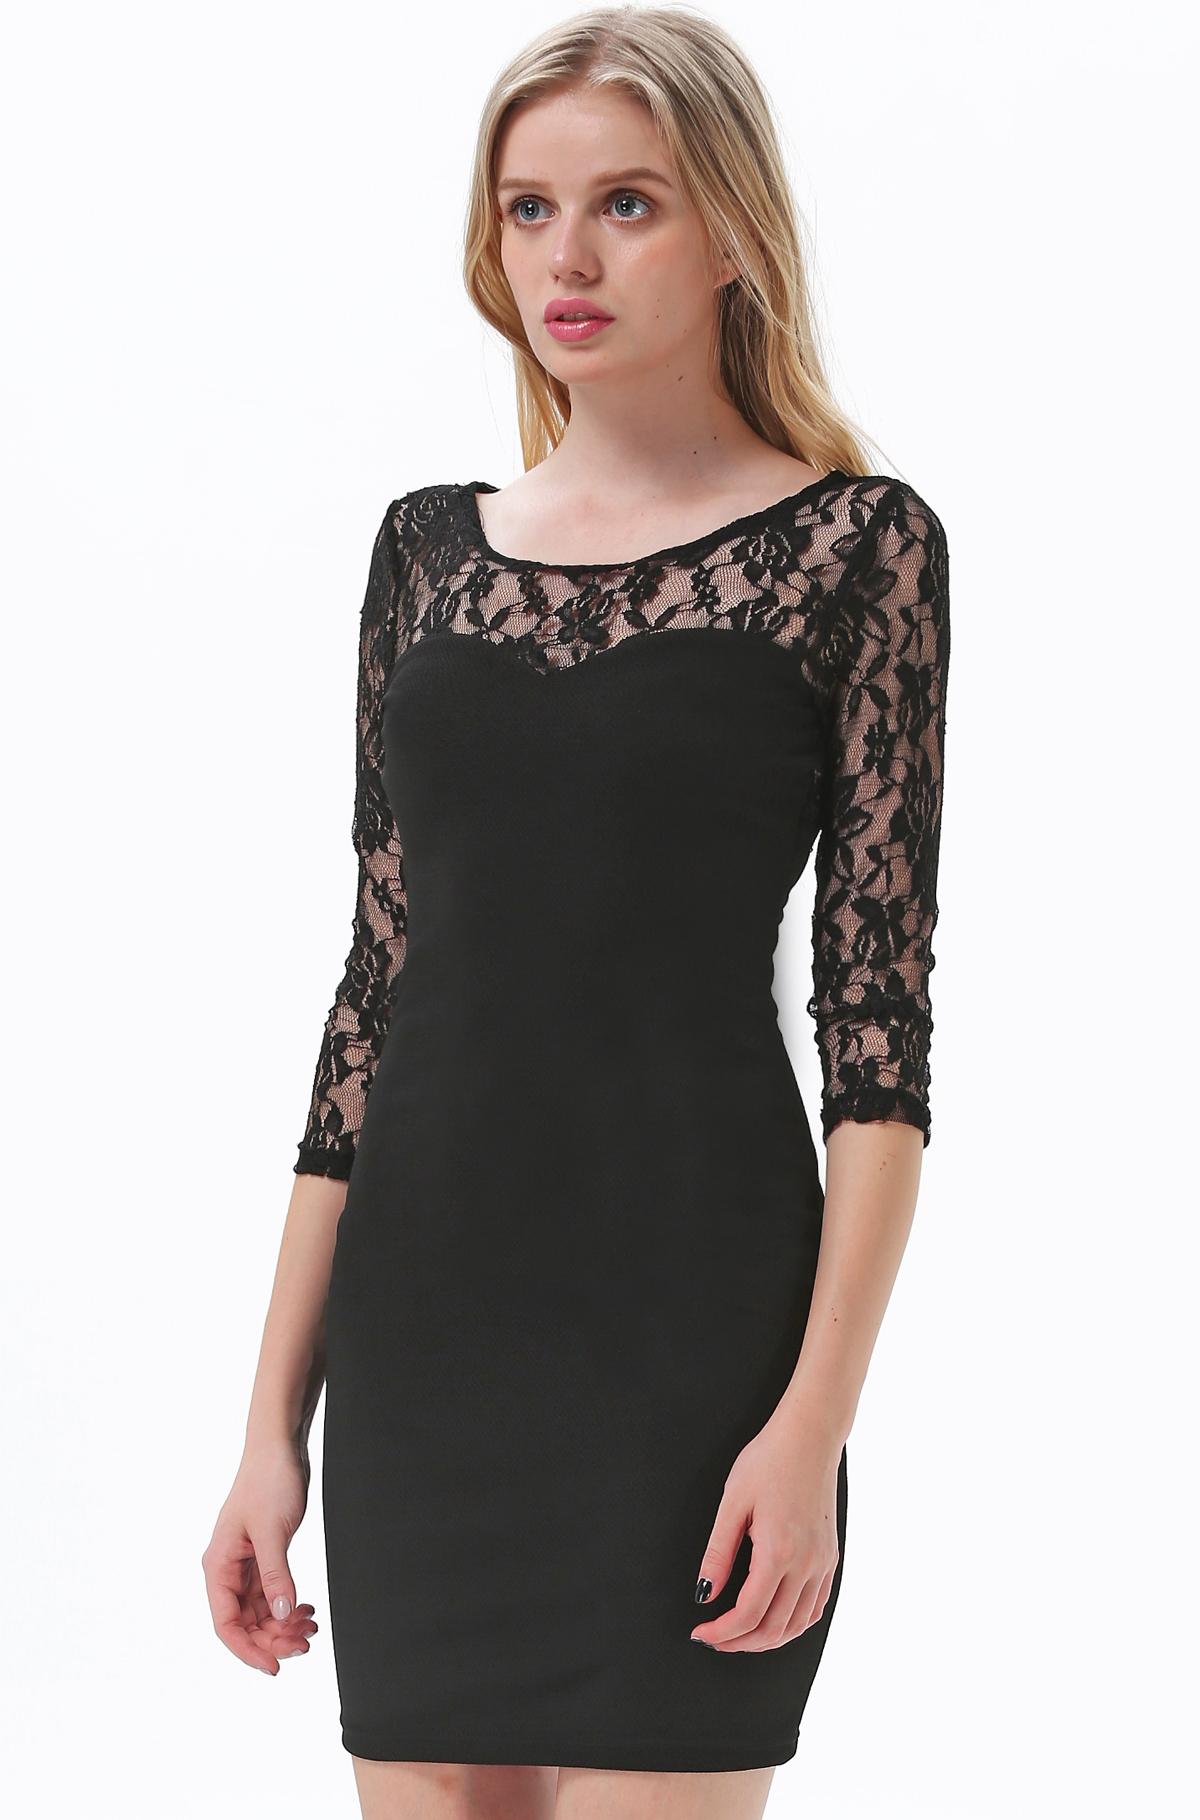 Black Contrast Vampy Lace Bodycon Dress - Sheinside.com